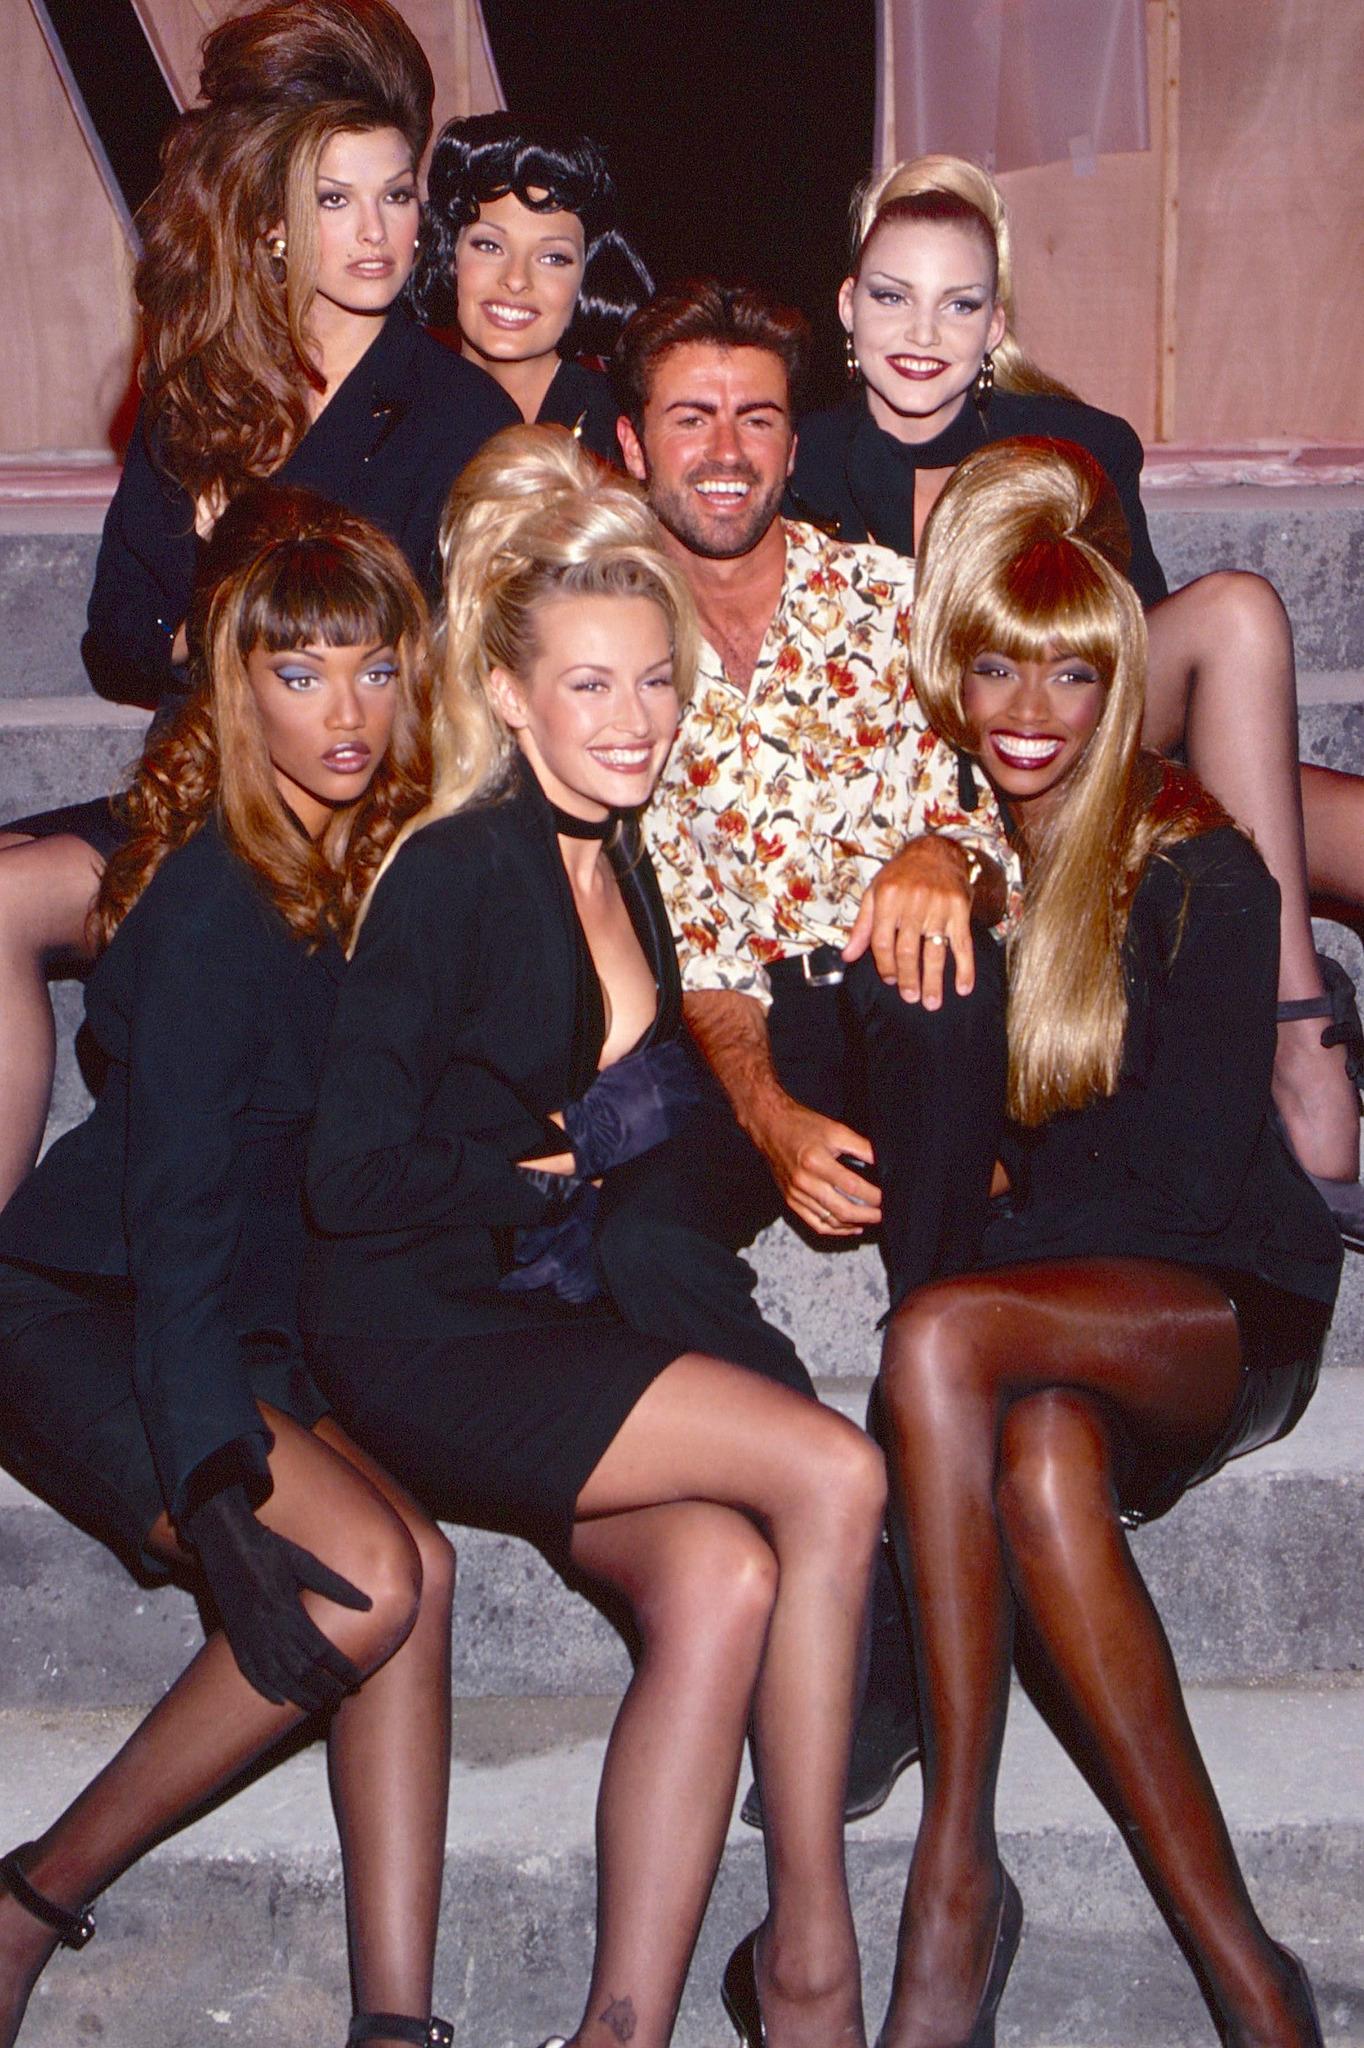 Tyra Banks, Linda Evangelista, Estelle Lefébure, George Michael, Nadja Auermann, Beverly Peele, and Shana Zadrick